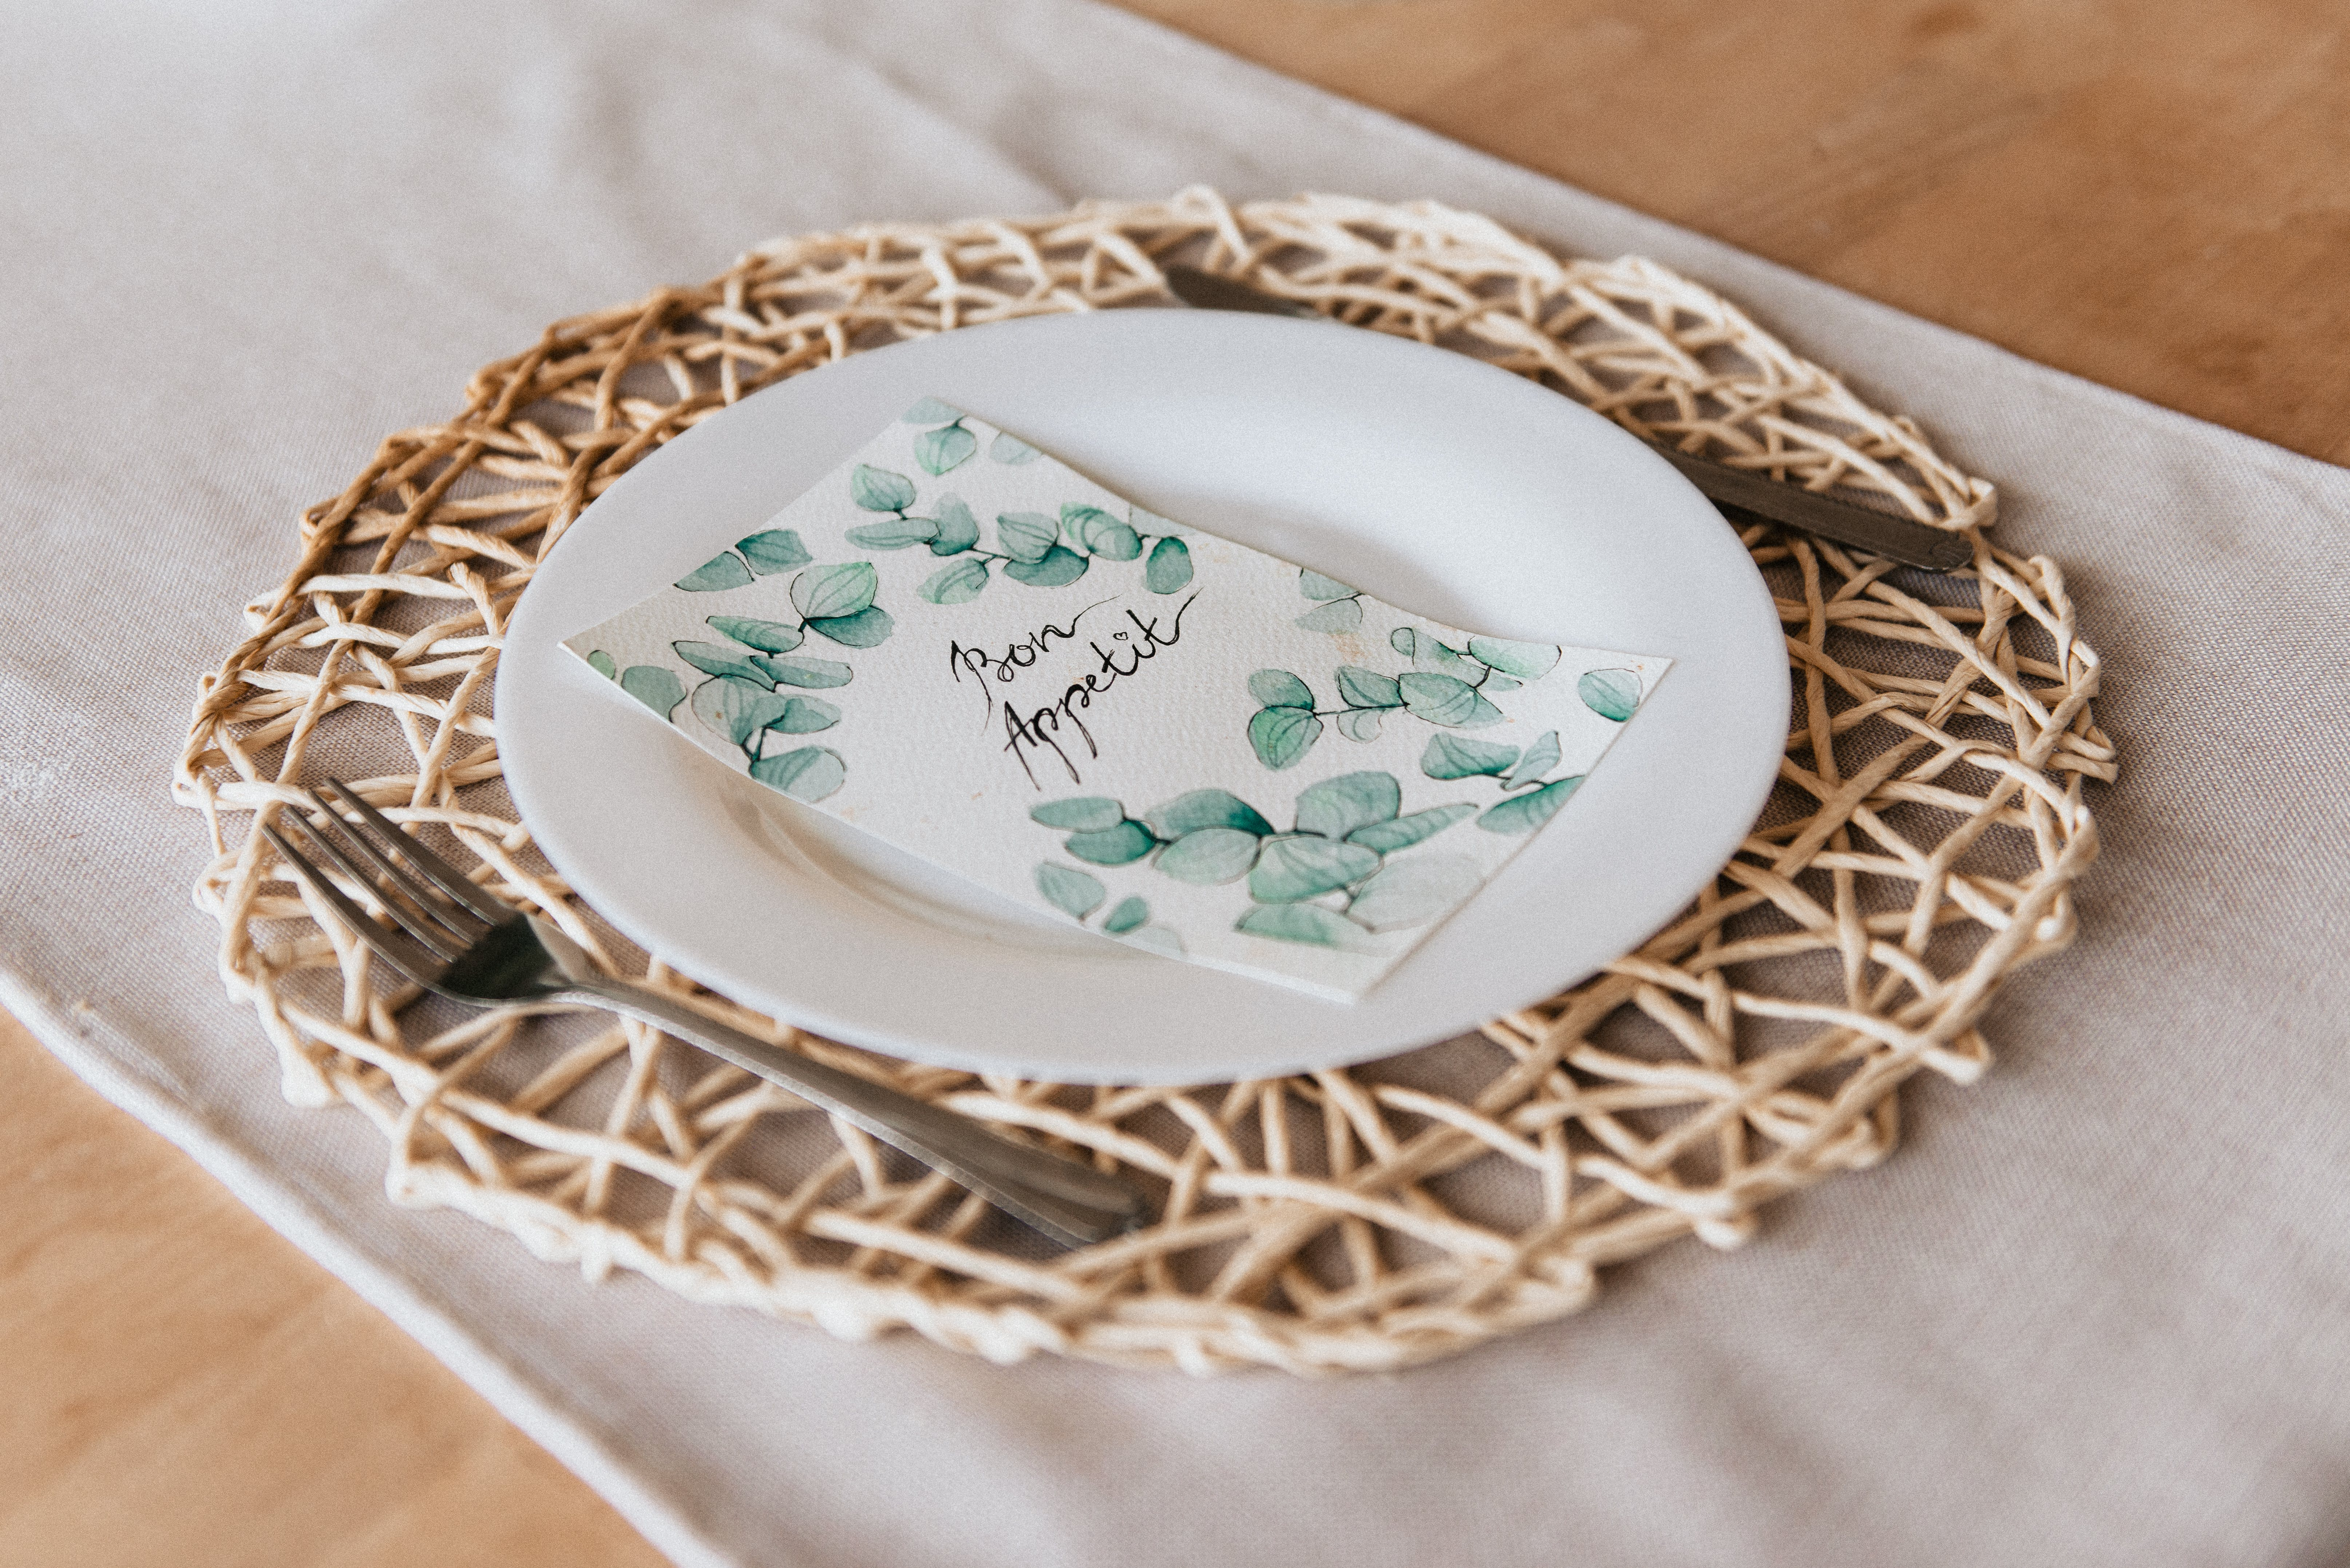 Round White Ceramic Decorative Plate on Brown Mat